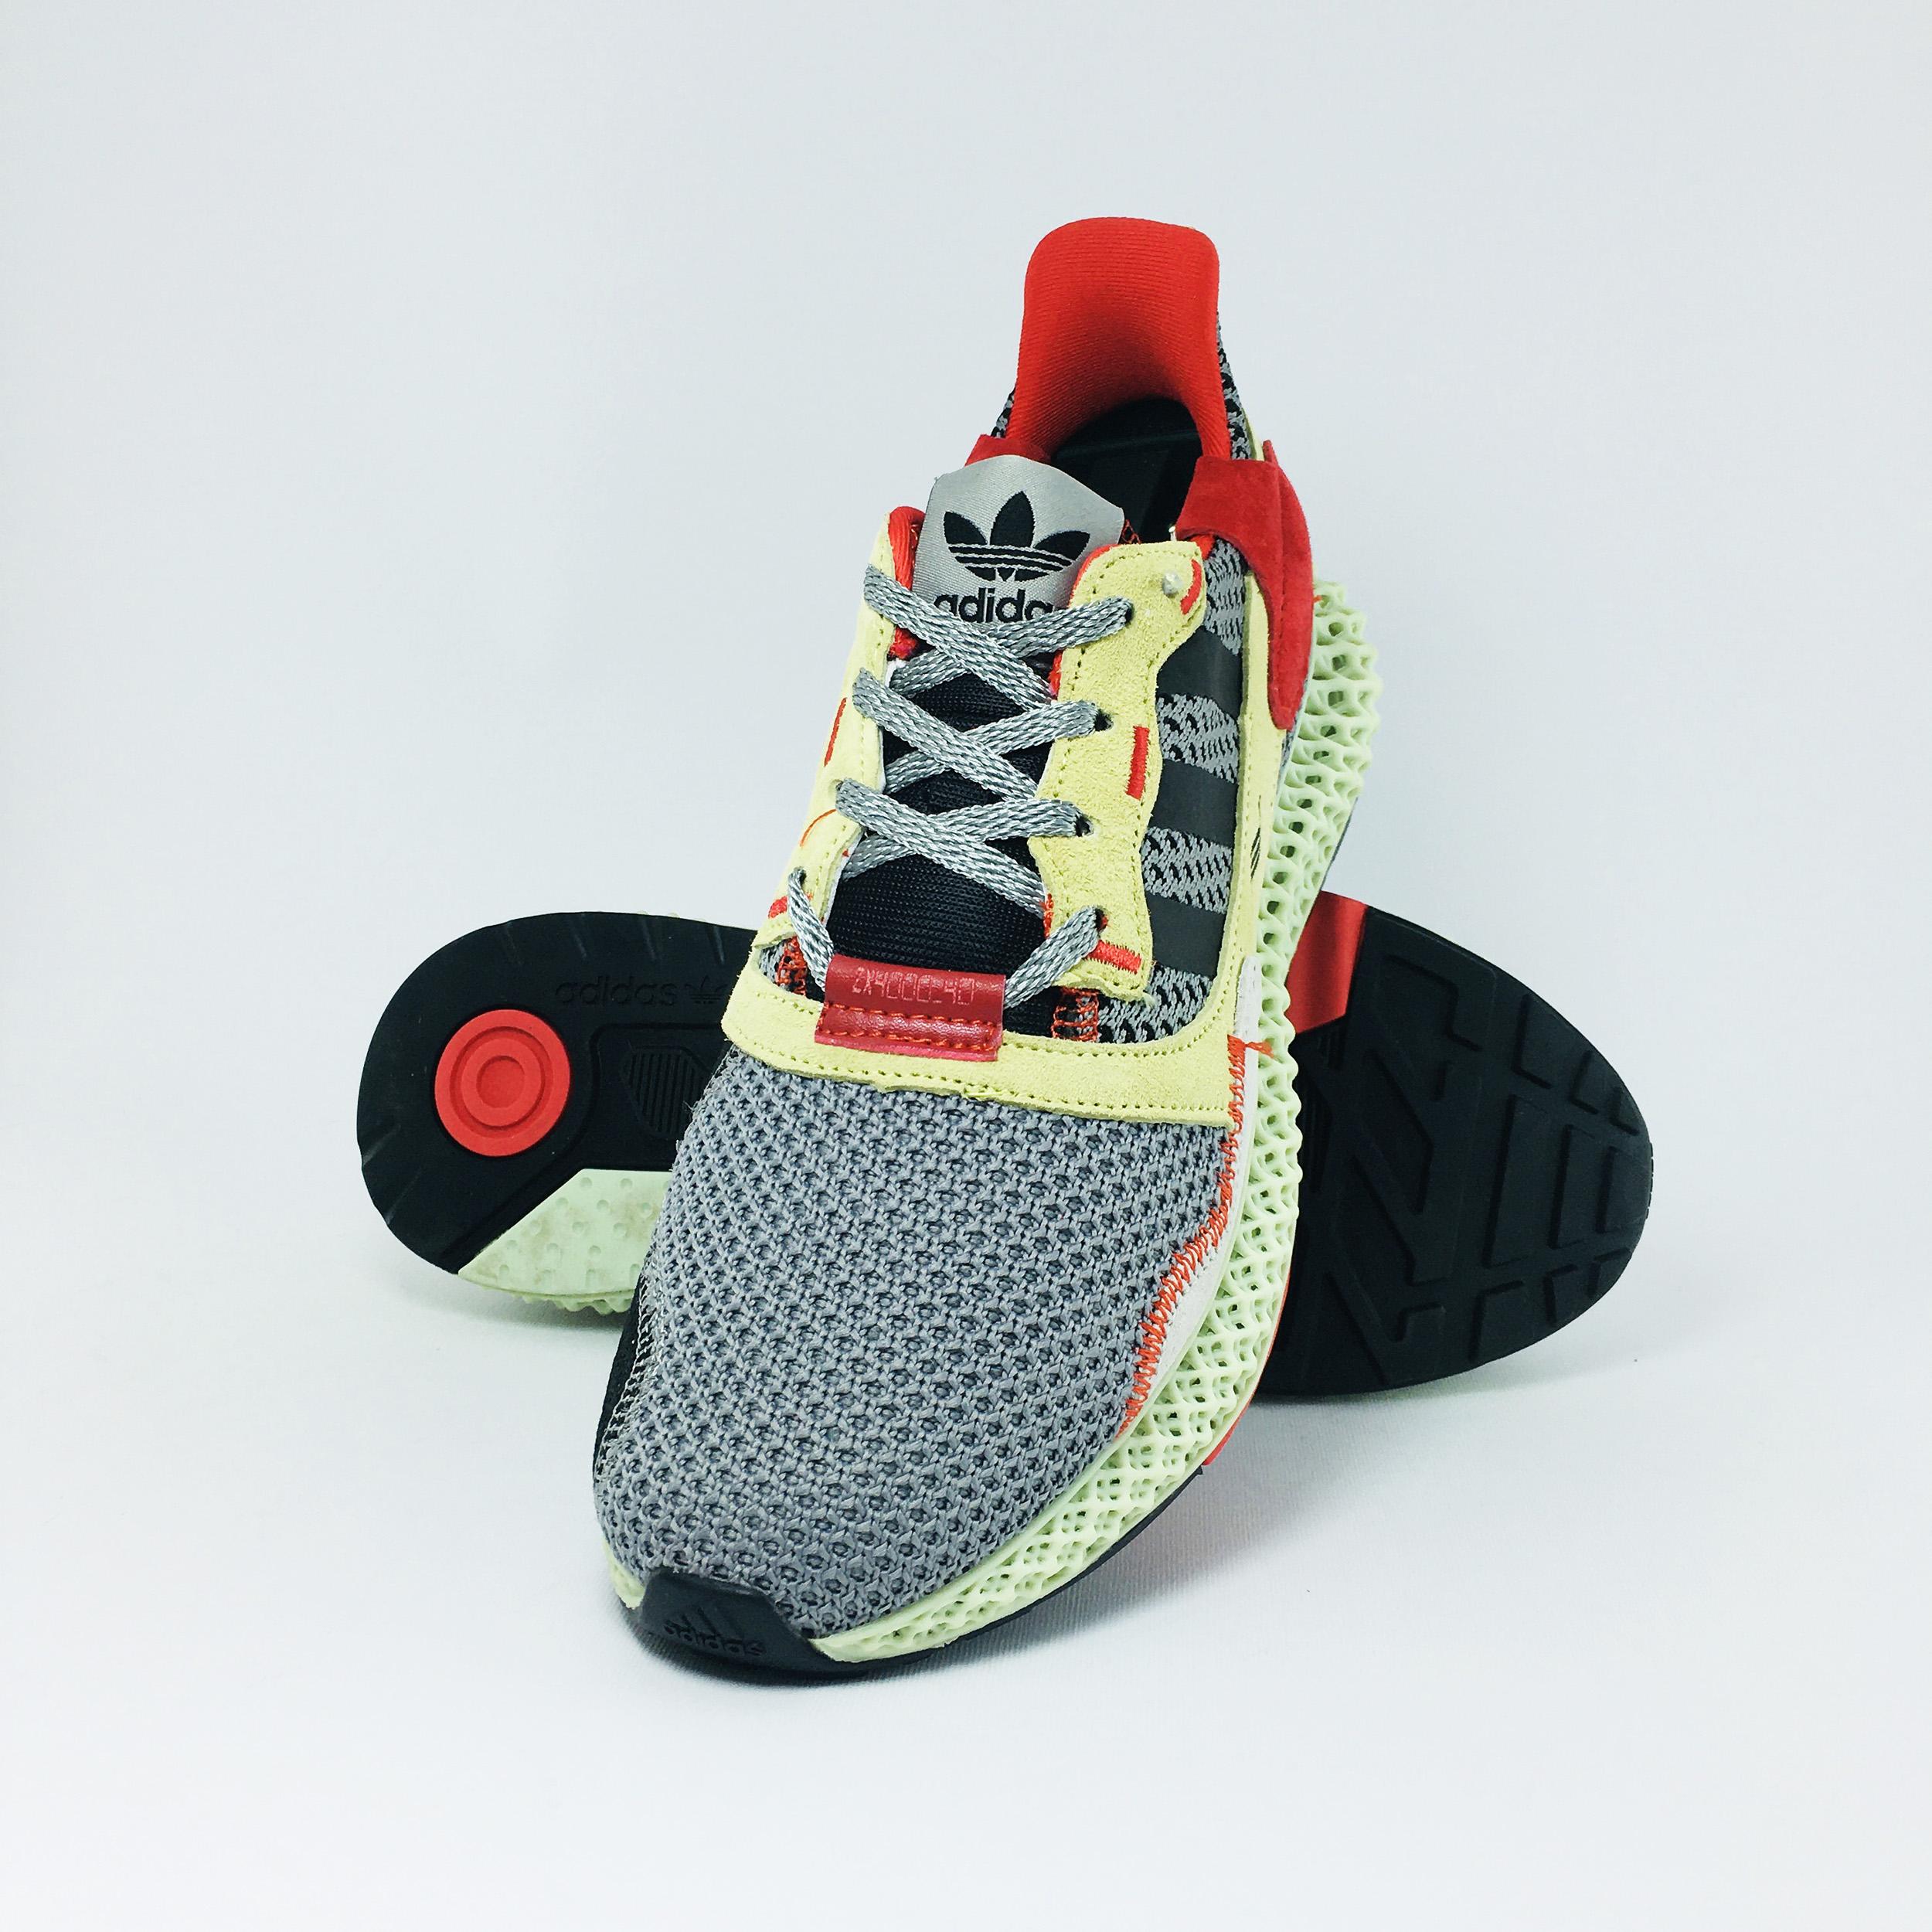 کفش مخصوص پیاده روی زنانه آدیداس مدل ZX4000 4D کد A46